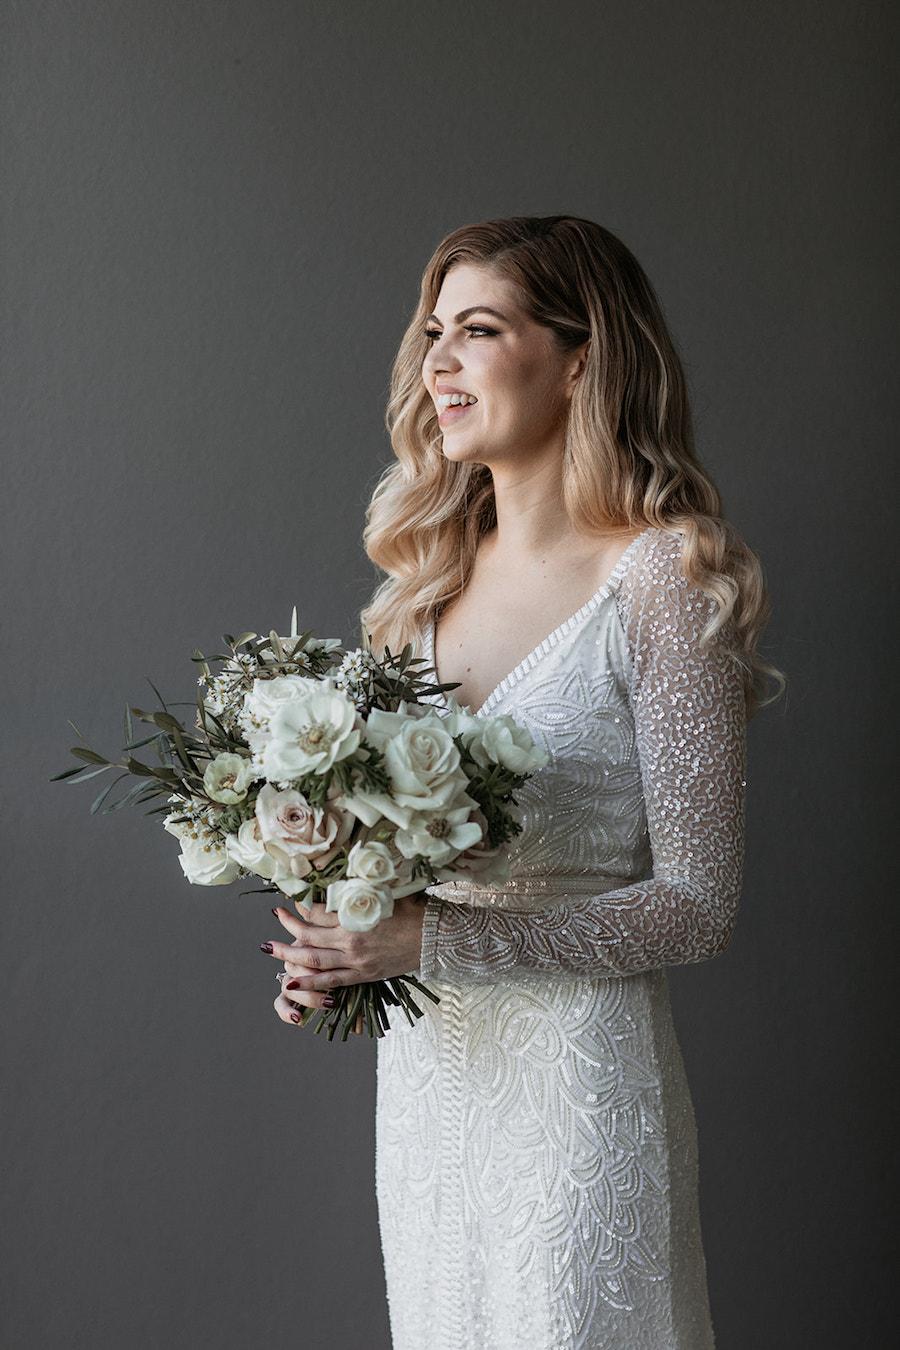 tweed-coast-weddings-wedding-venue-osteria-kelly-rohan-cloud-catcher-photography-Web_RK159.jpg